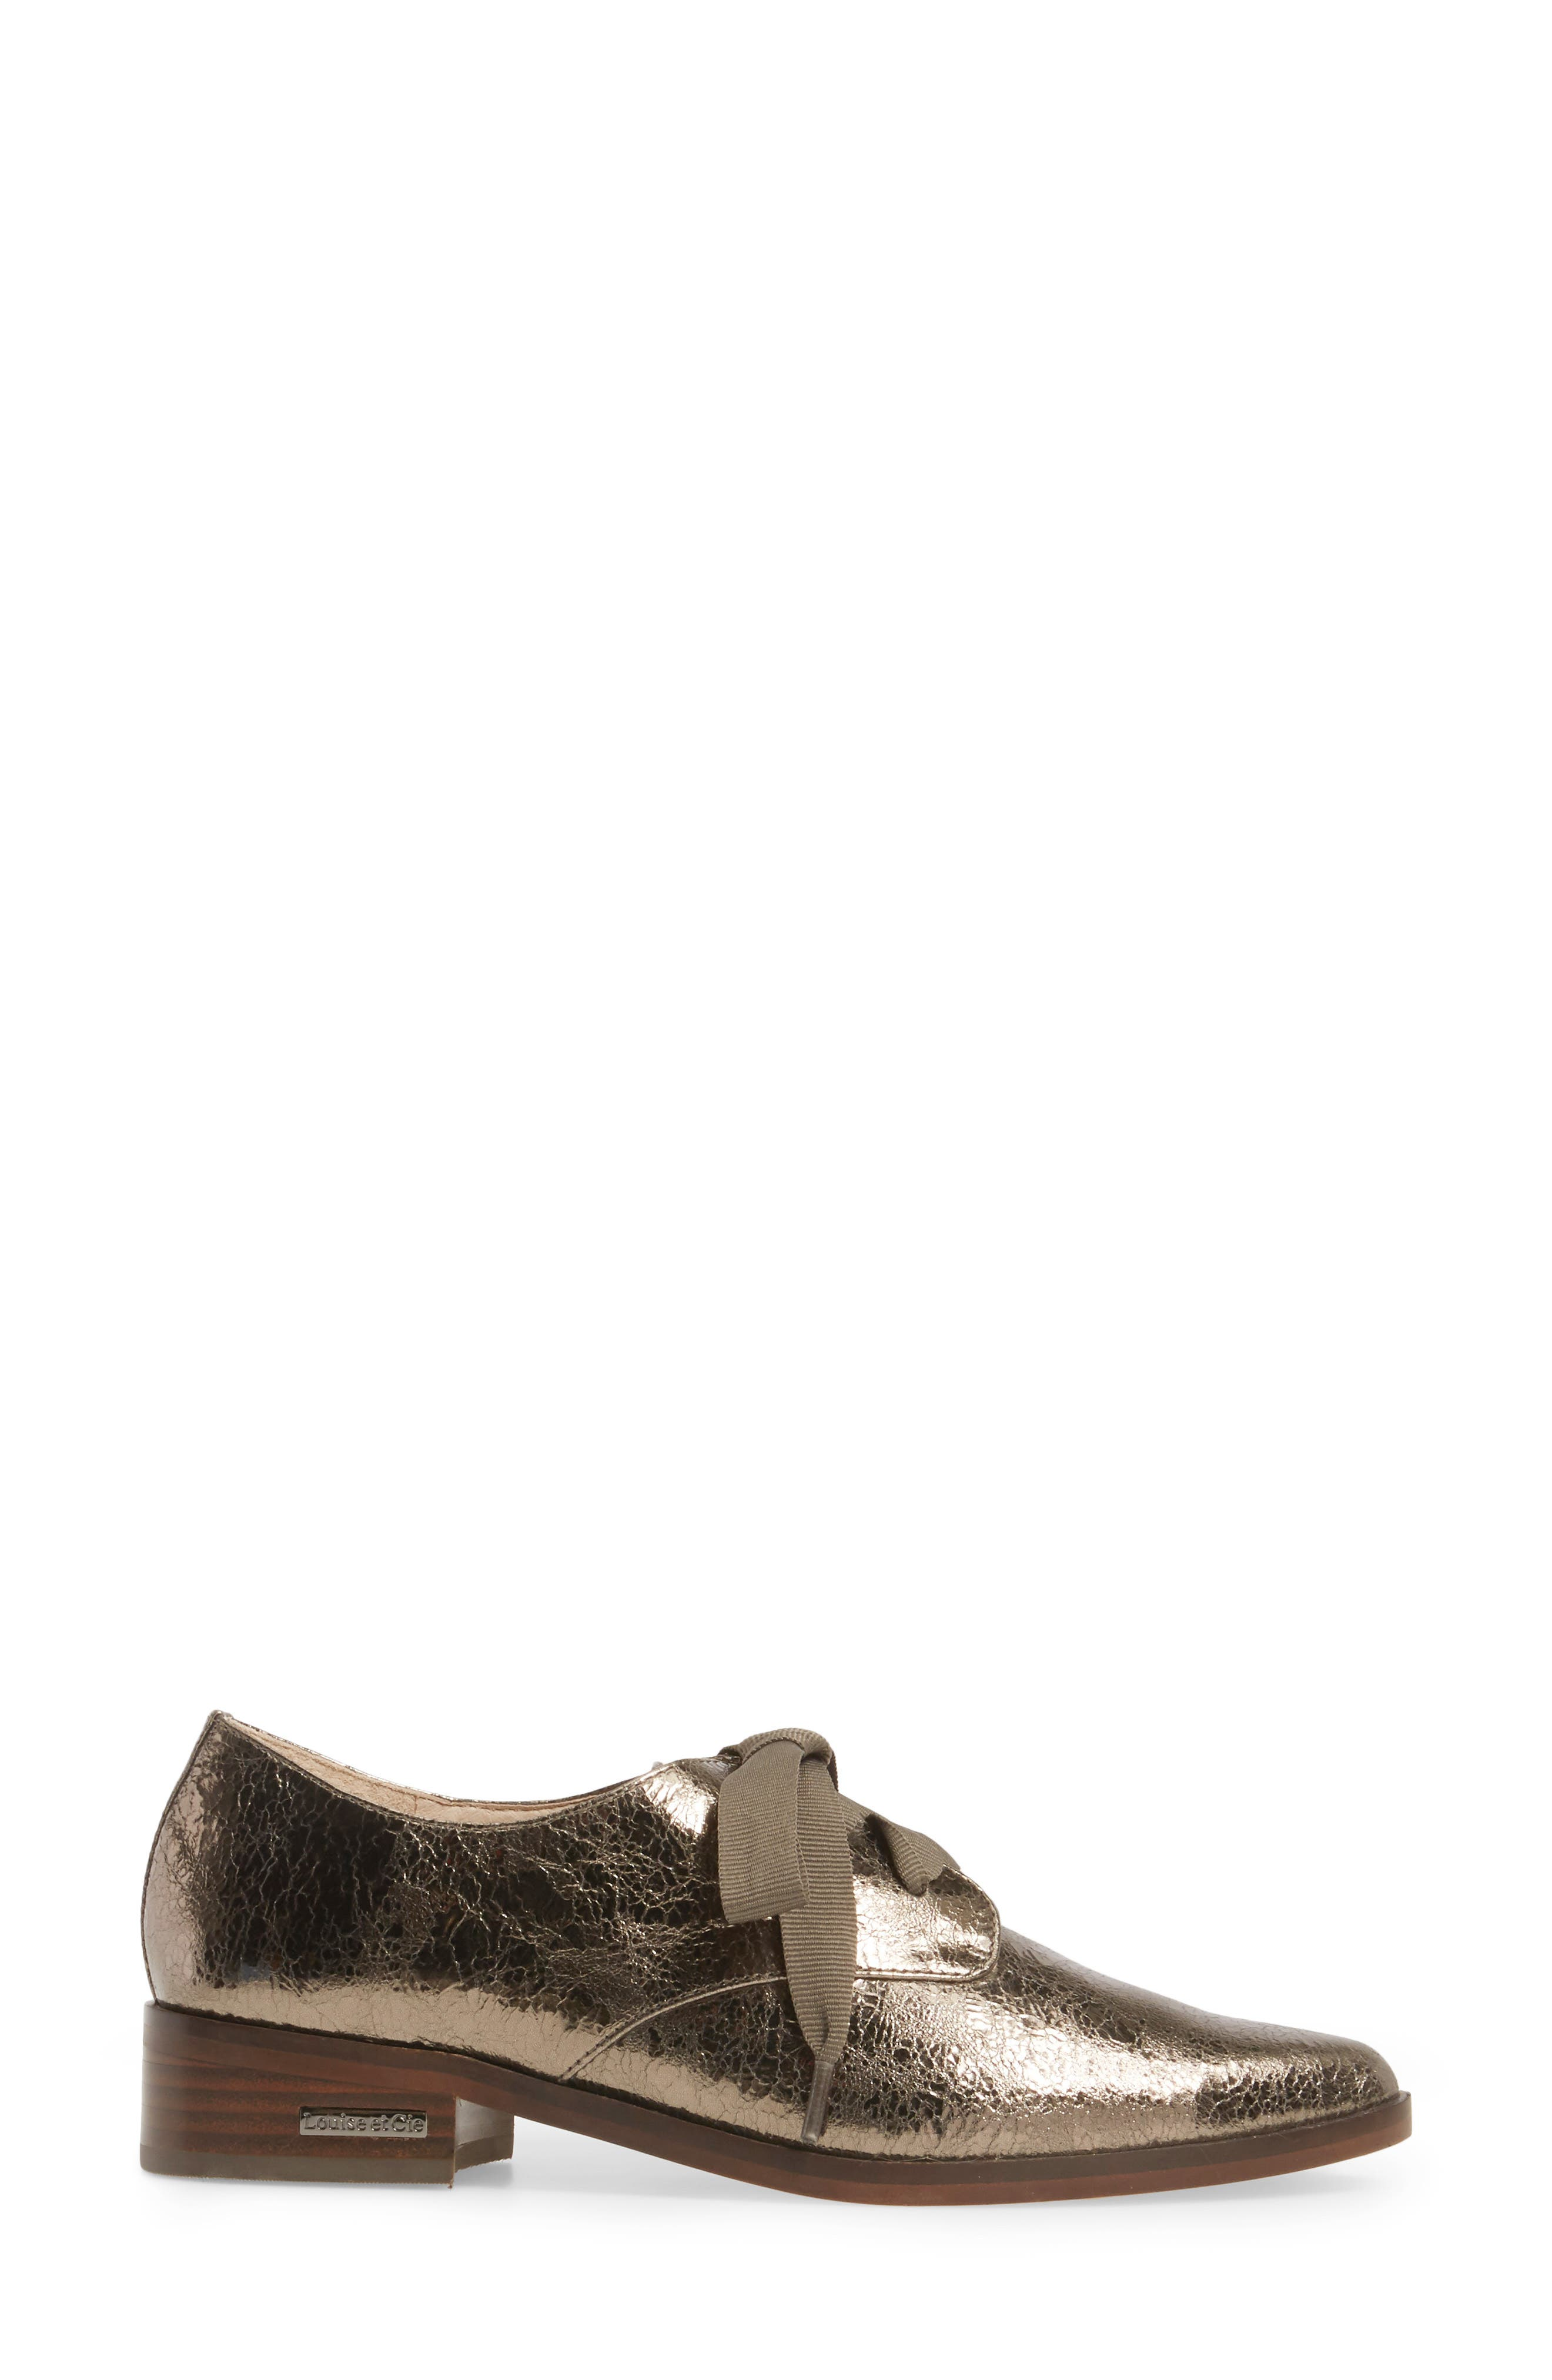 Alternate Image 3  - Louise et Cie 'Adwin' Almond Toe Oxford (Women) (Nordstrom Exclusive)